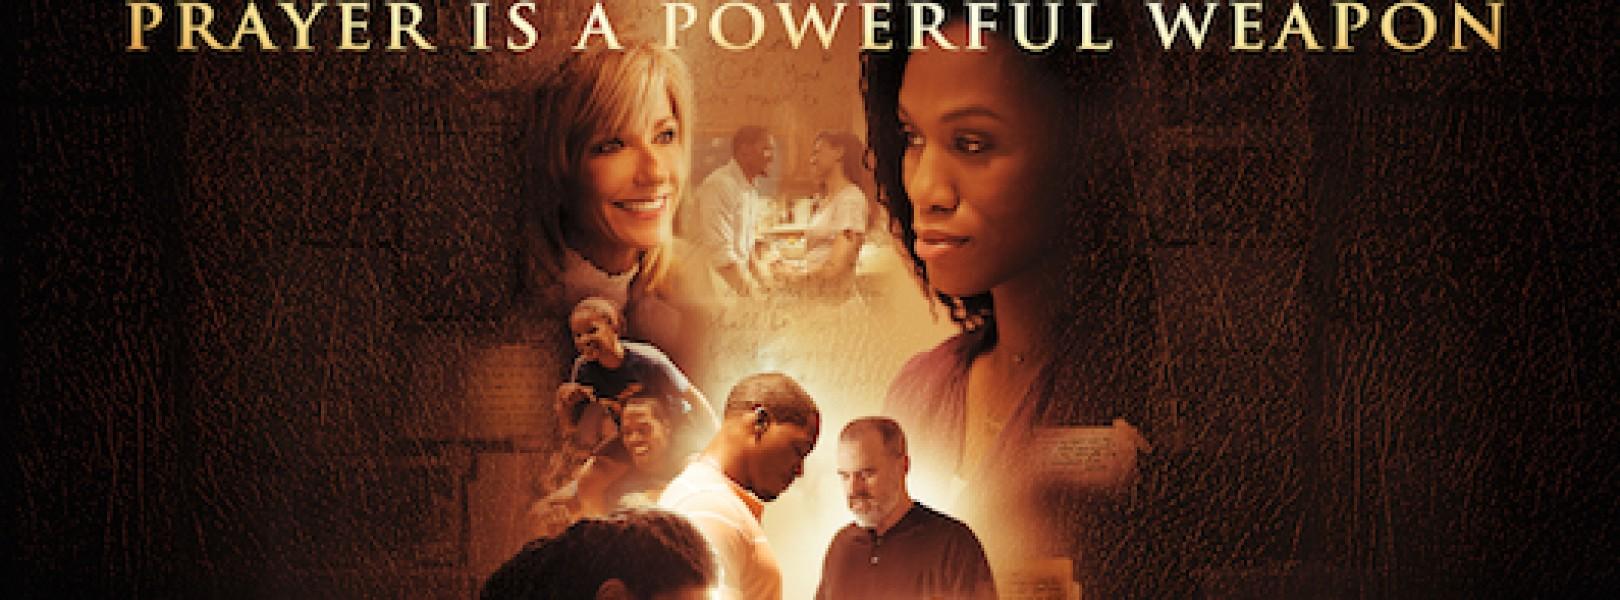 Christian movie reviews dove